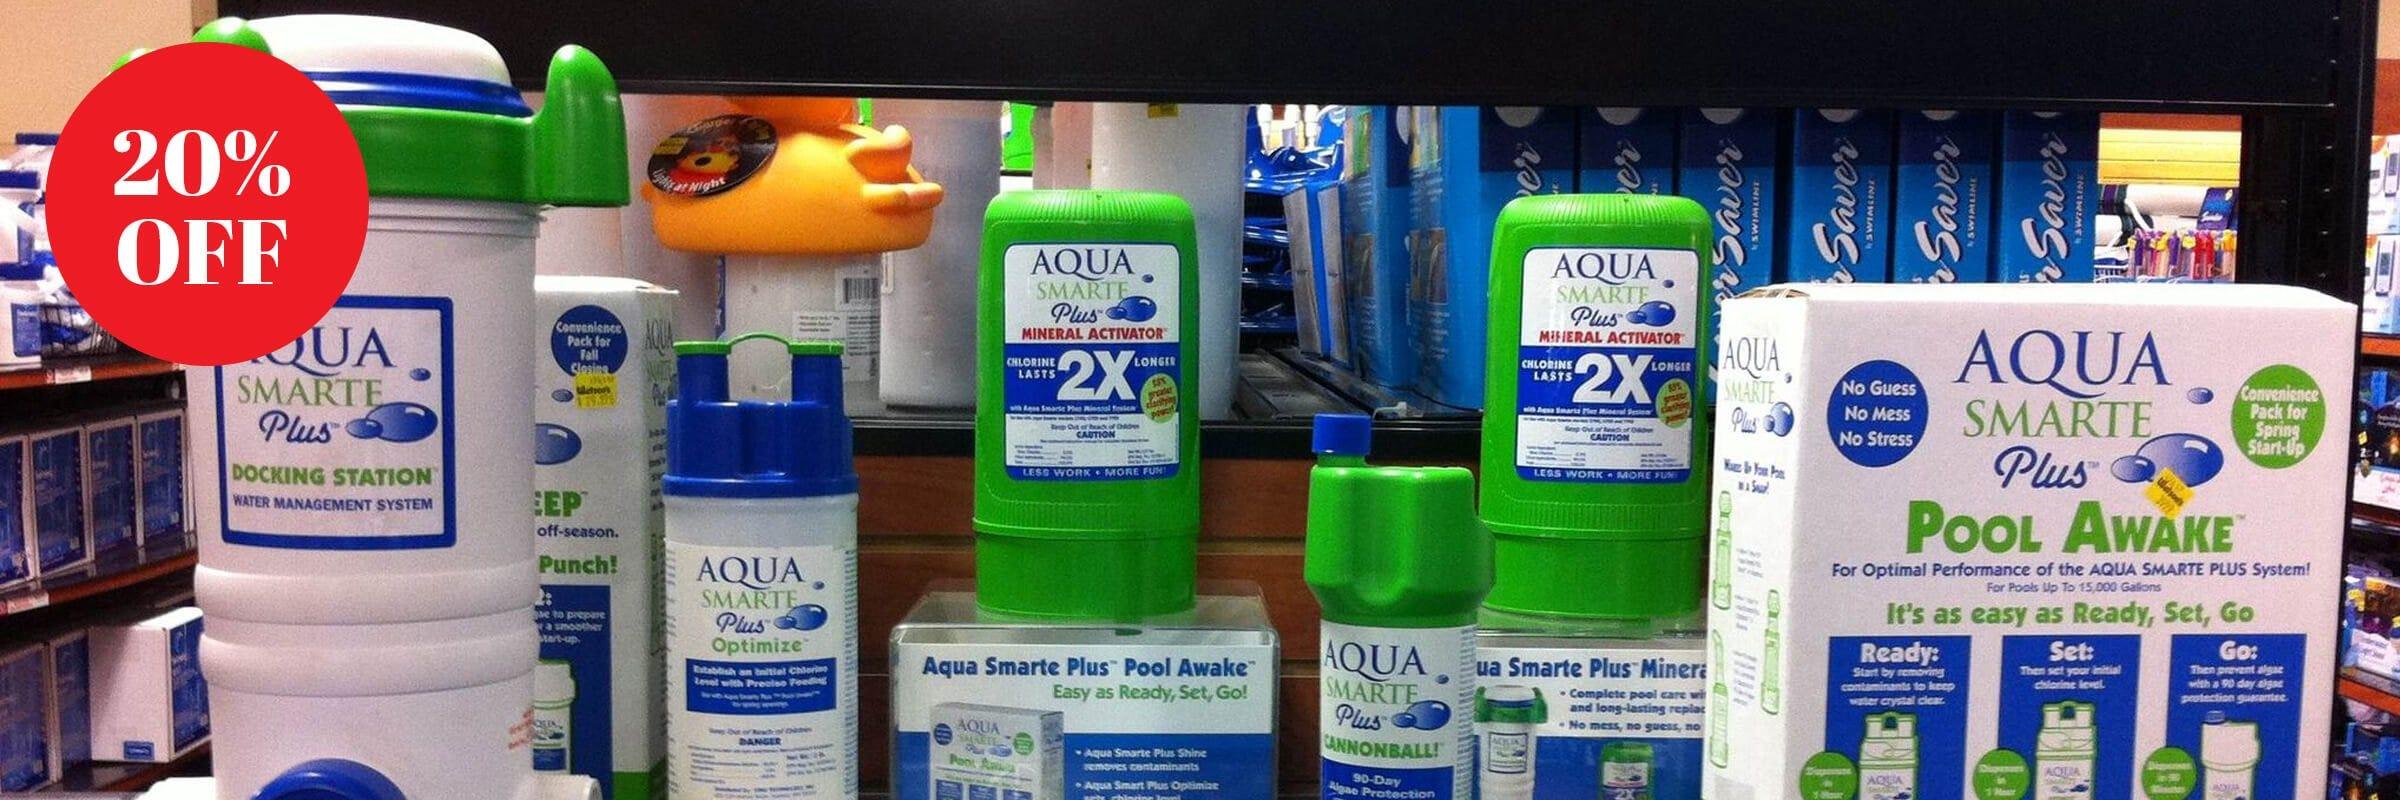 Pool & Spa Supplies